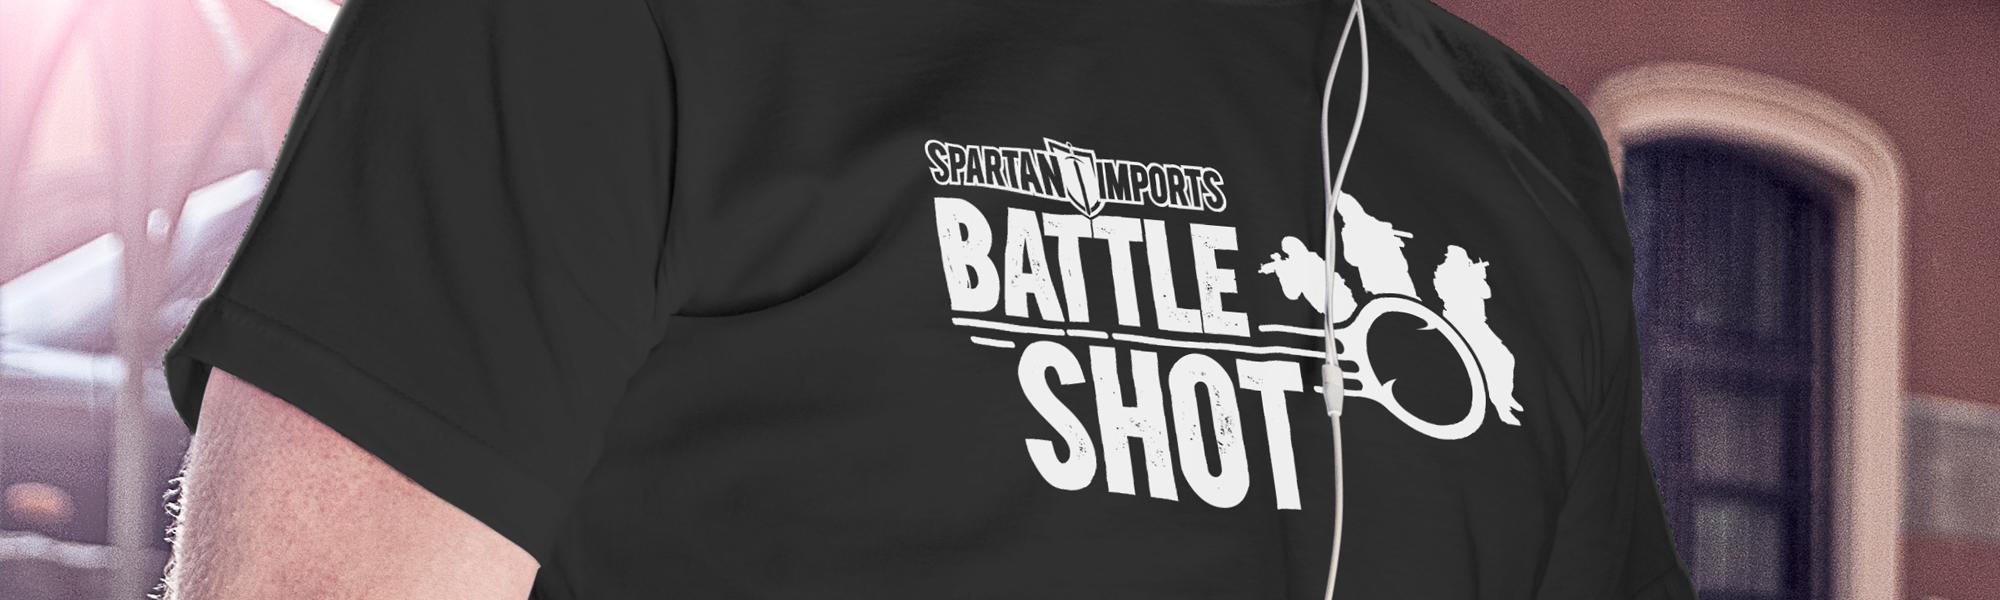 Spartan Imports Battle Shot